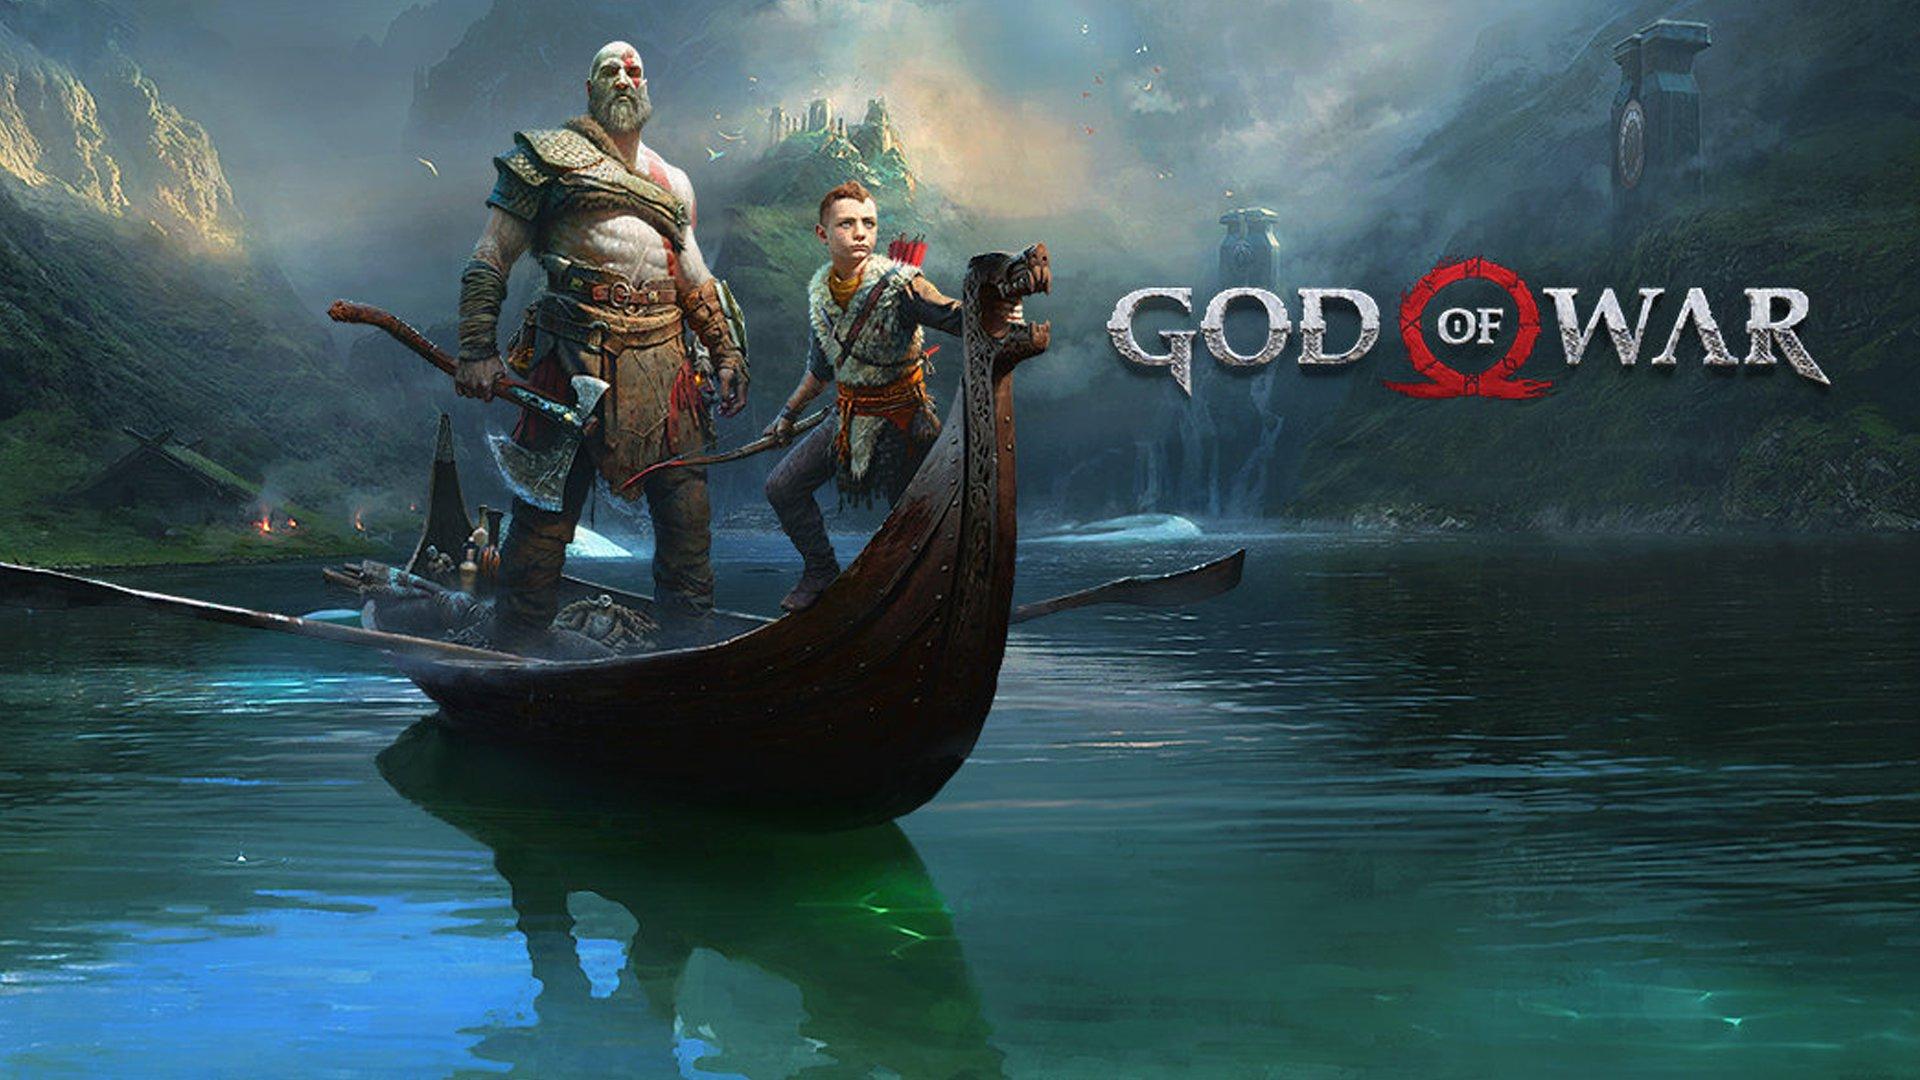 god-of-war-(2018)-hd-wallpapers-33166-800503.jpg